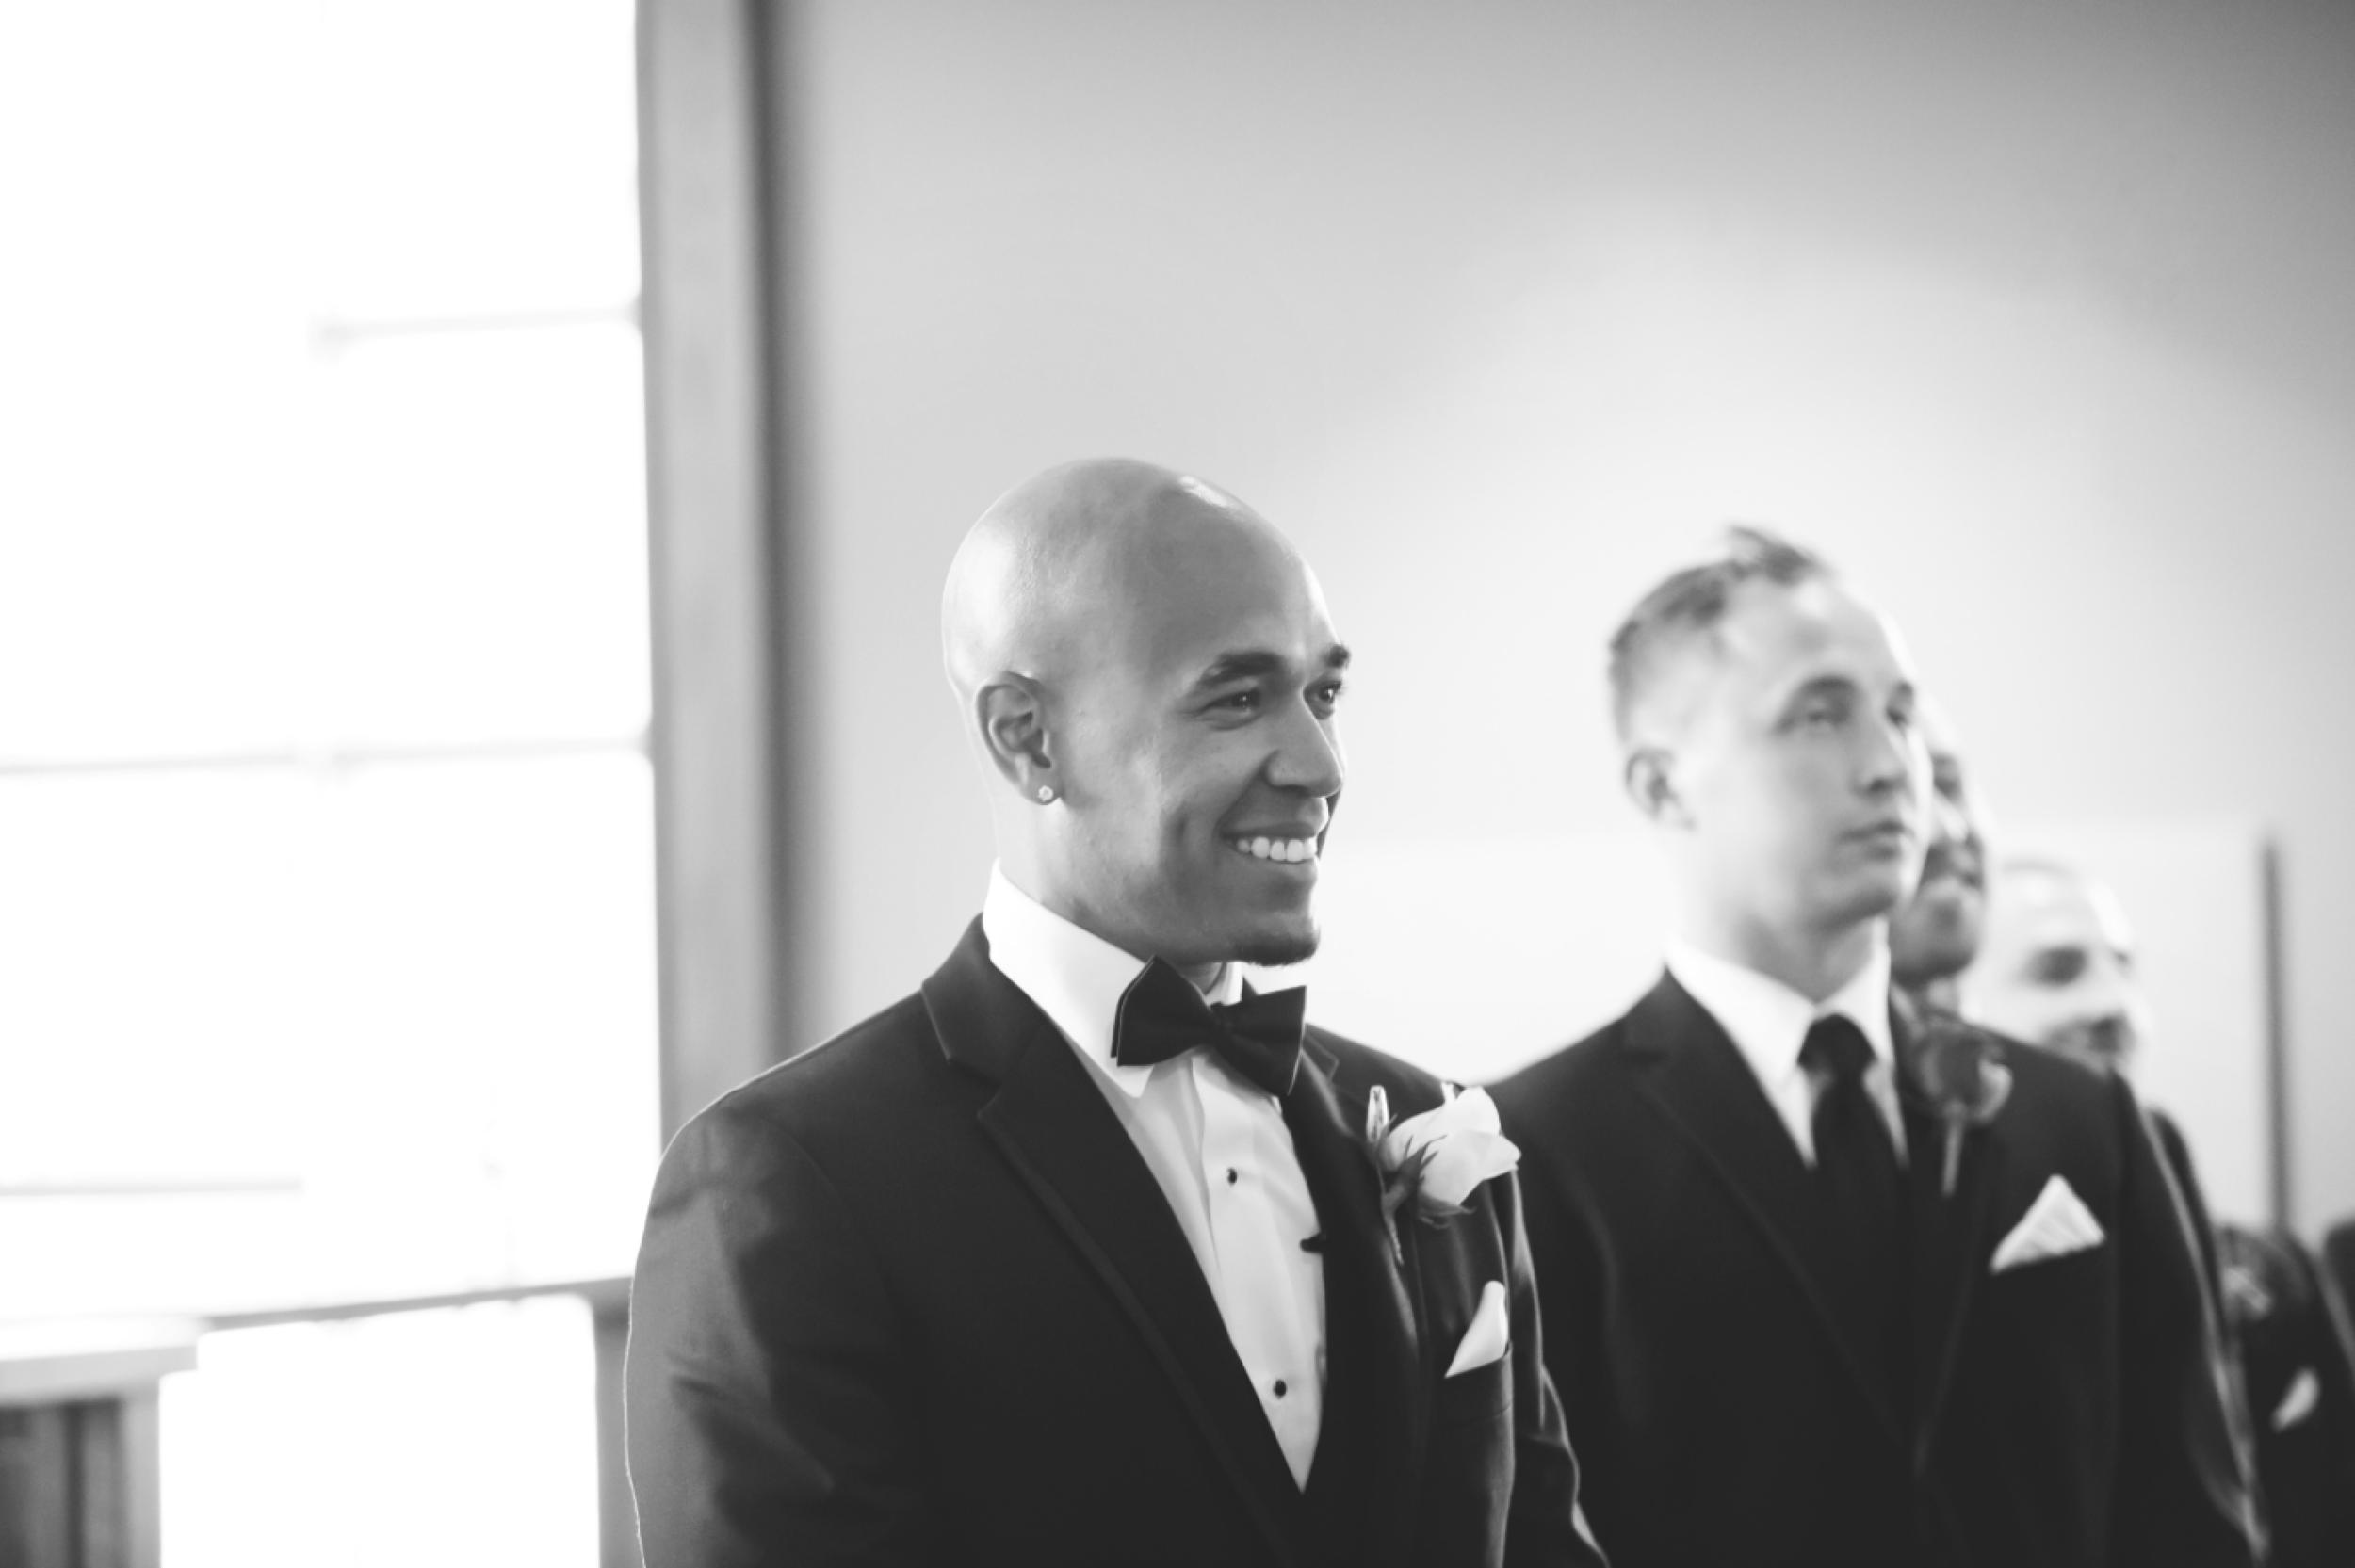 Wedding-Burlington-Convention-Center-Burlington-Oakville-Toronto-Hamilton-Niagara-Wedding-Photographer-Photography-Moments-by-Lauren-Photo-Image-17.png